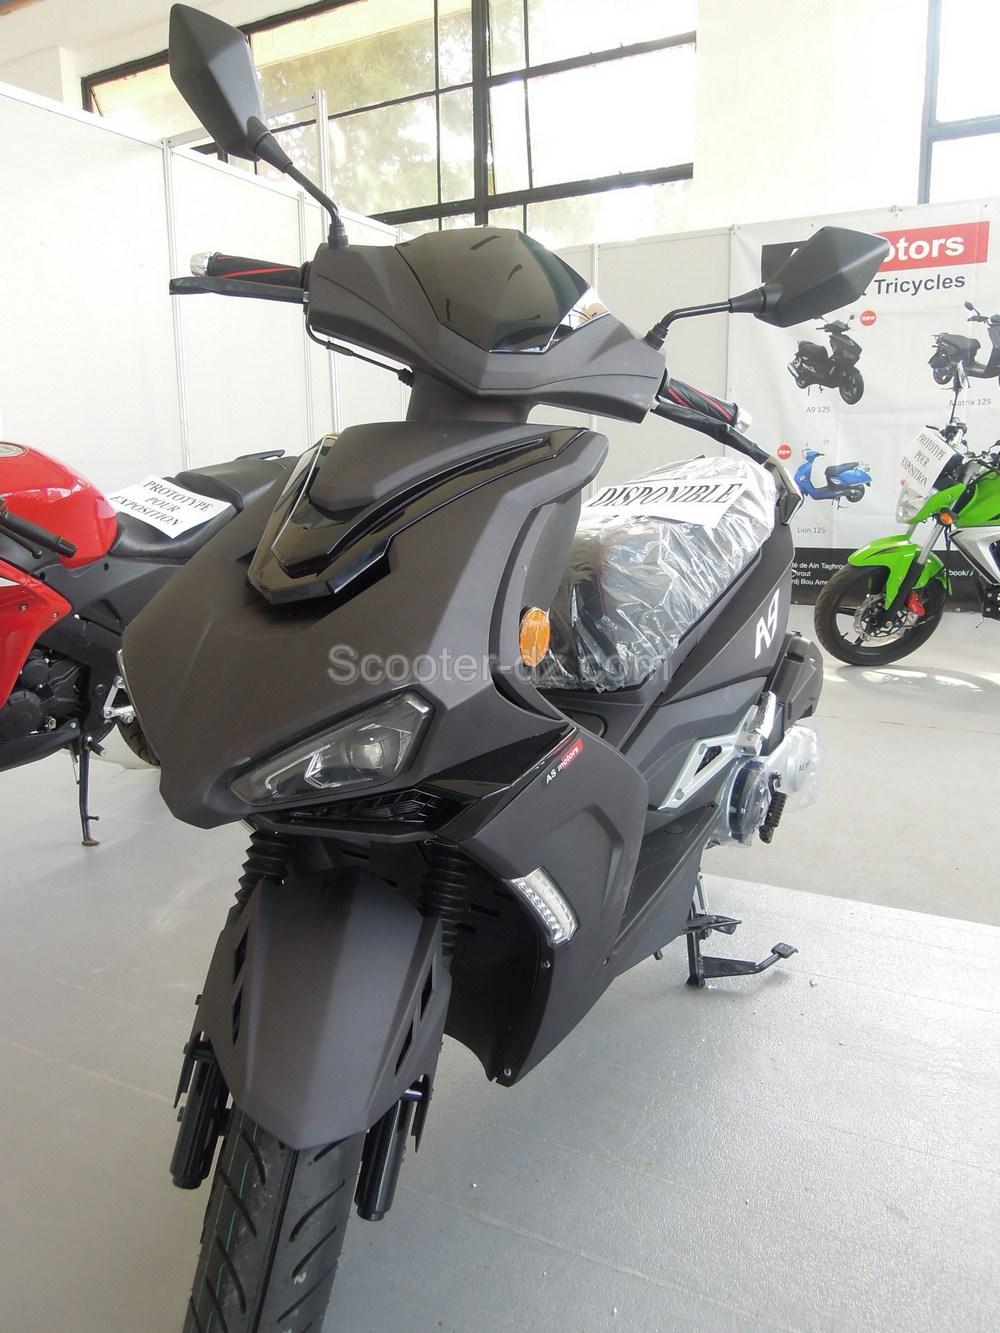 moto scooter okinoi